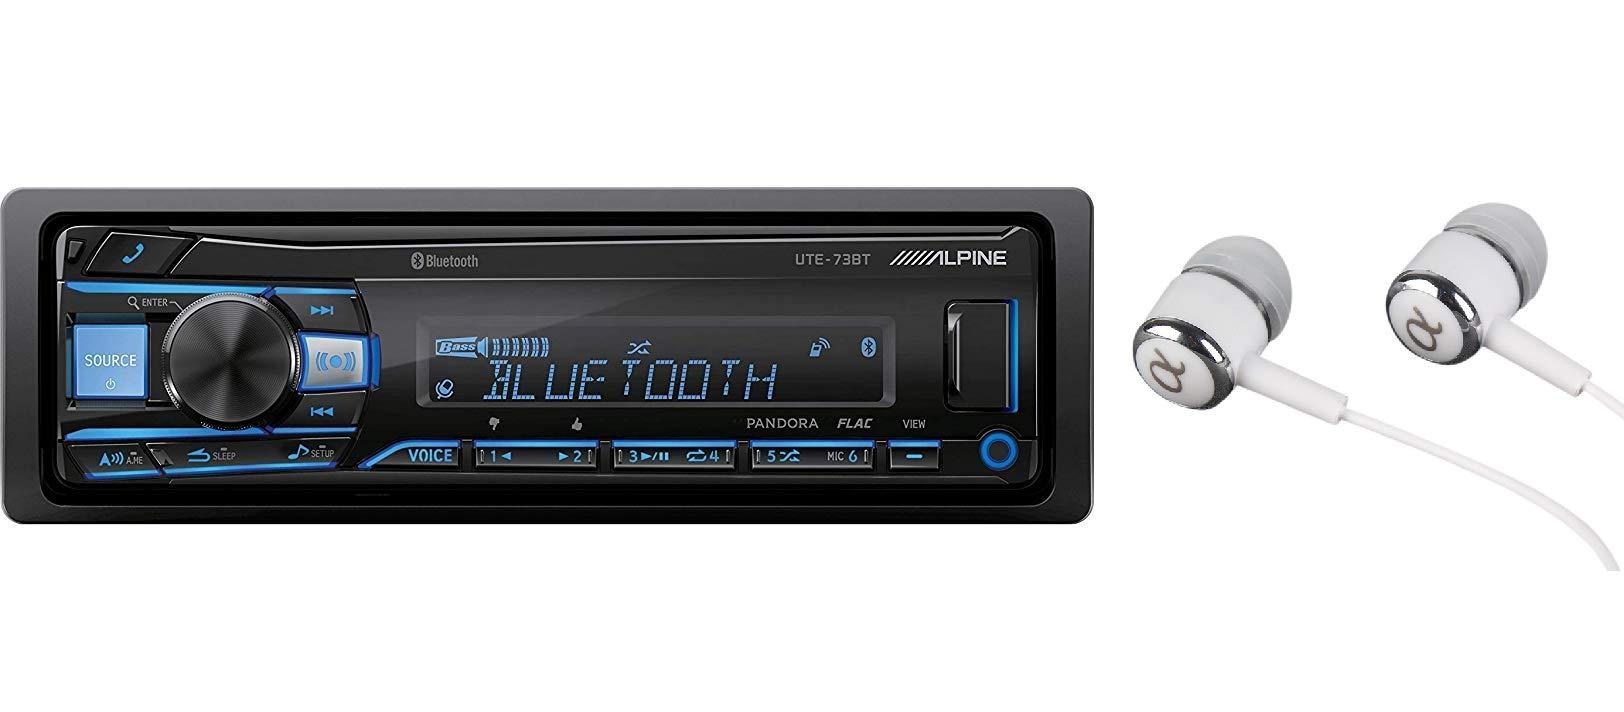 Alpine UTE-73BT in-Dash Single DIN MP3 AM/FM Receiver Dual USB, Front Auxiliary, iPhone Pandora Internet Radio, Variable Color Illumination, Digital Media Receiver/Free ALPHASONIK Earbuds